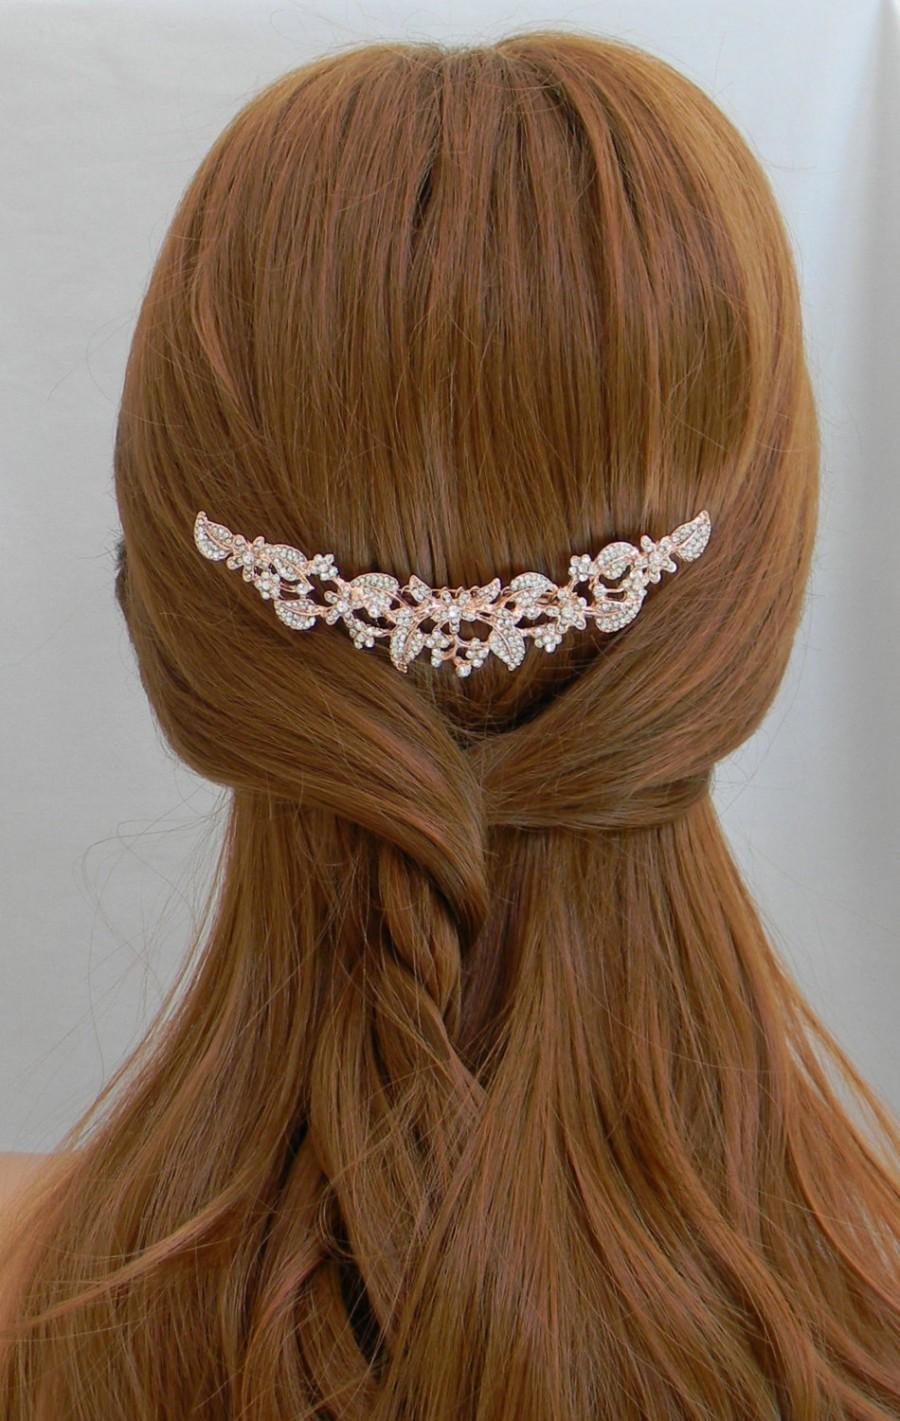 Hochzeit - Rose Gold Hair Comb, Wedding Hair comb, Rose Gold headpiece, Swarovski, Rhinestone hair comb, Bridal headpiece, Ivy Hair Comb